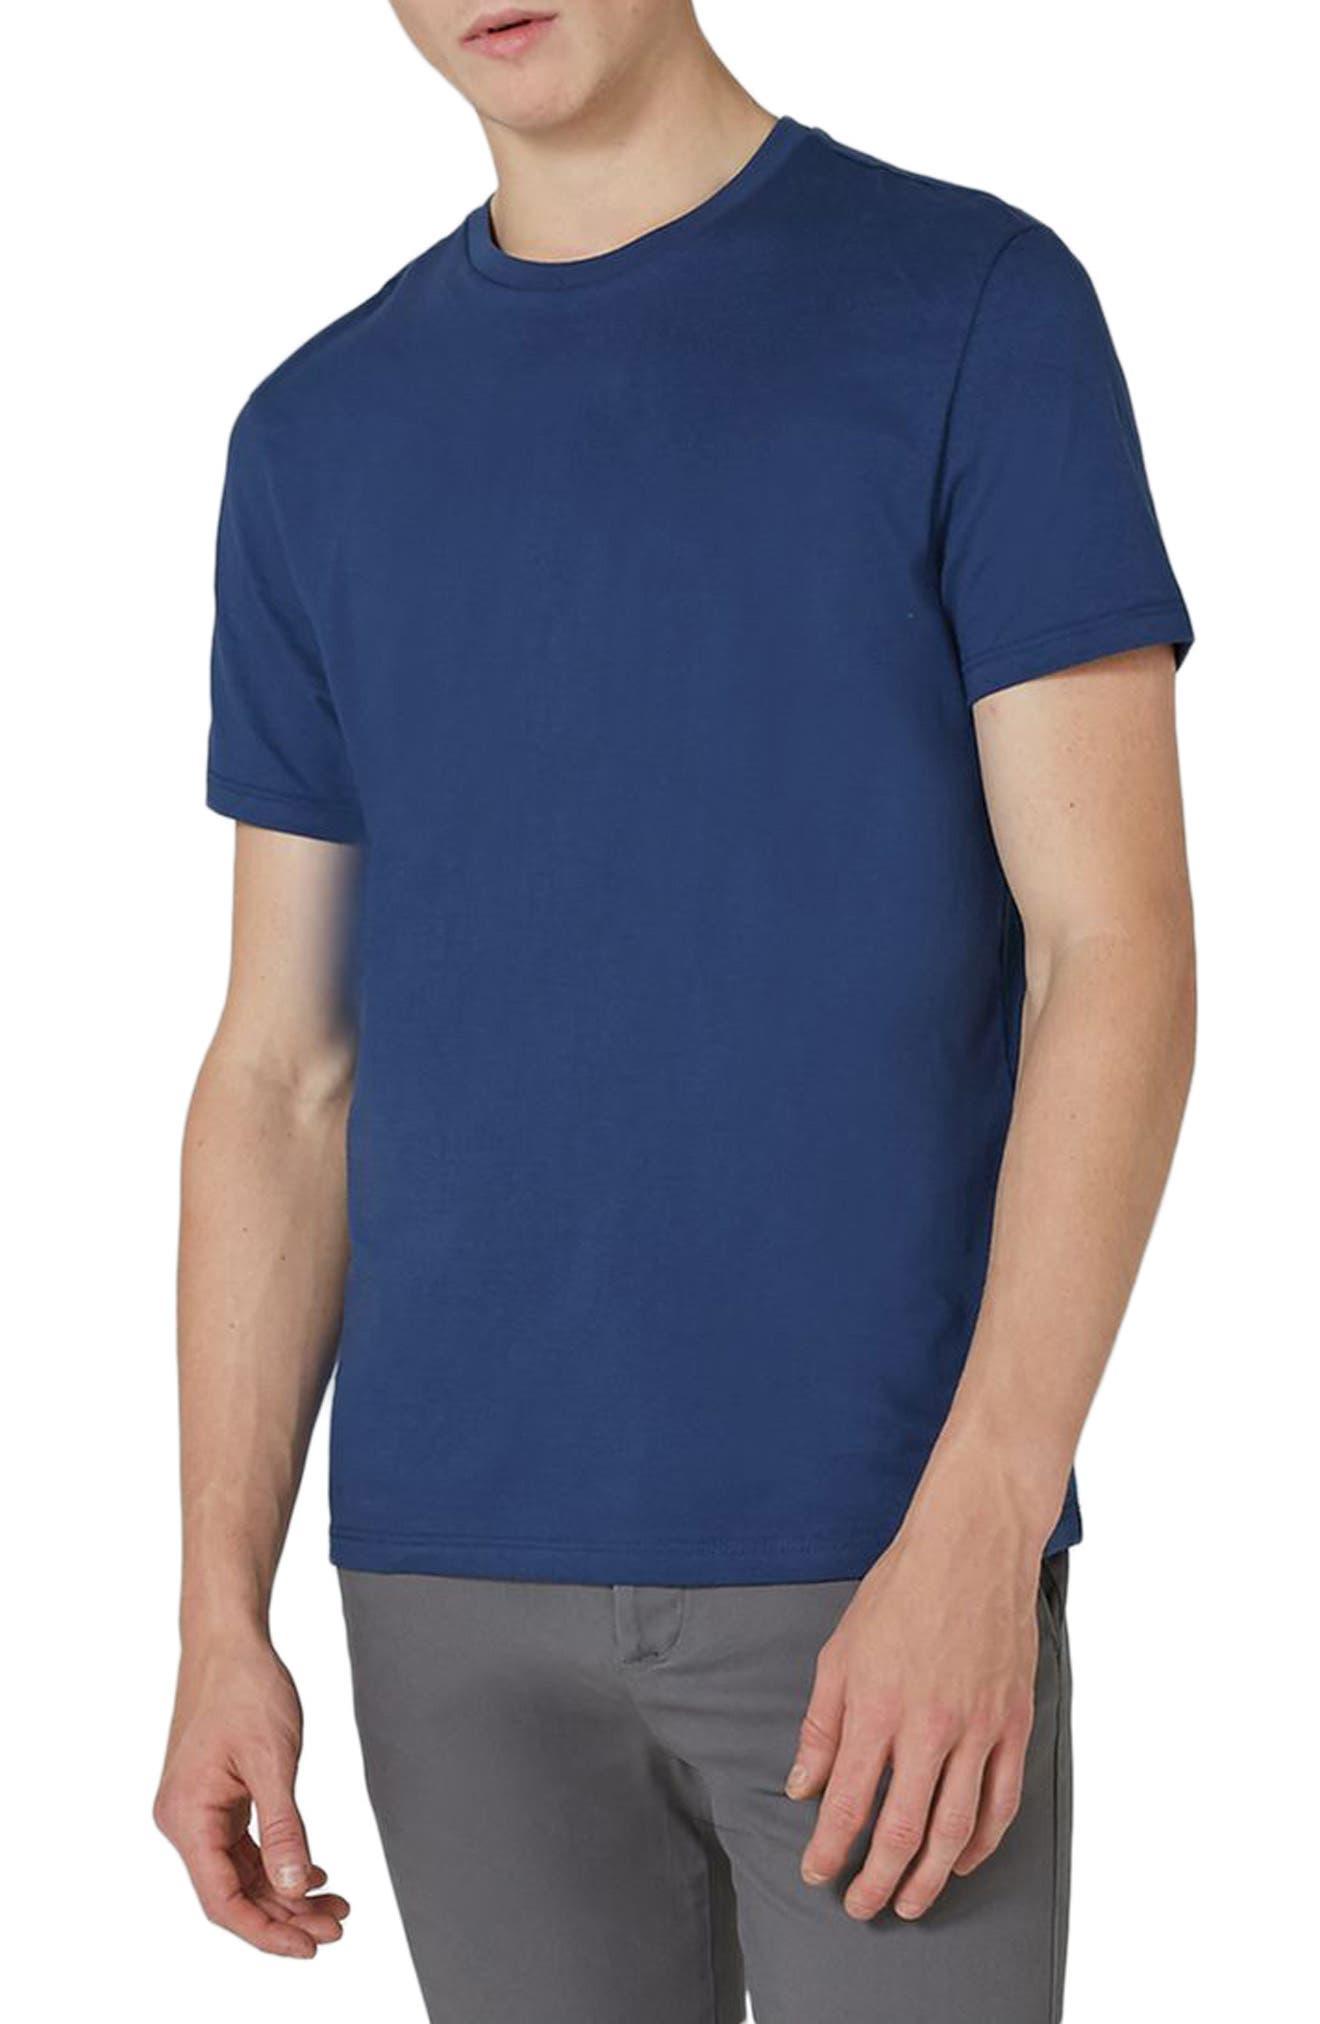 TOPMAN Slim Fit Crewneck T-Shirt, Main, color, 450